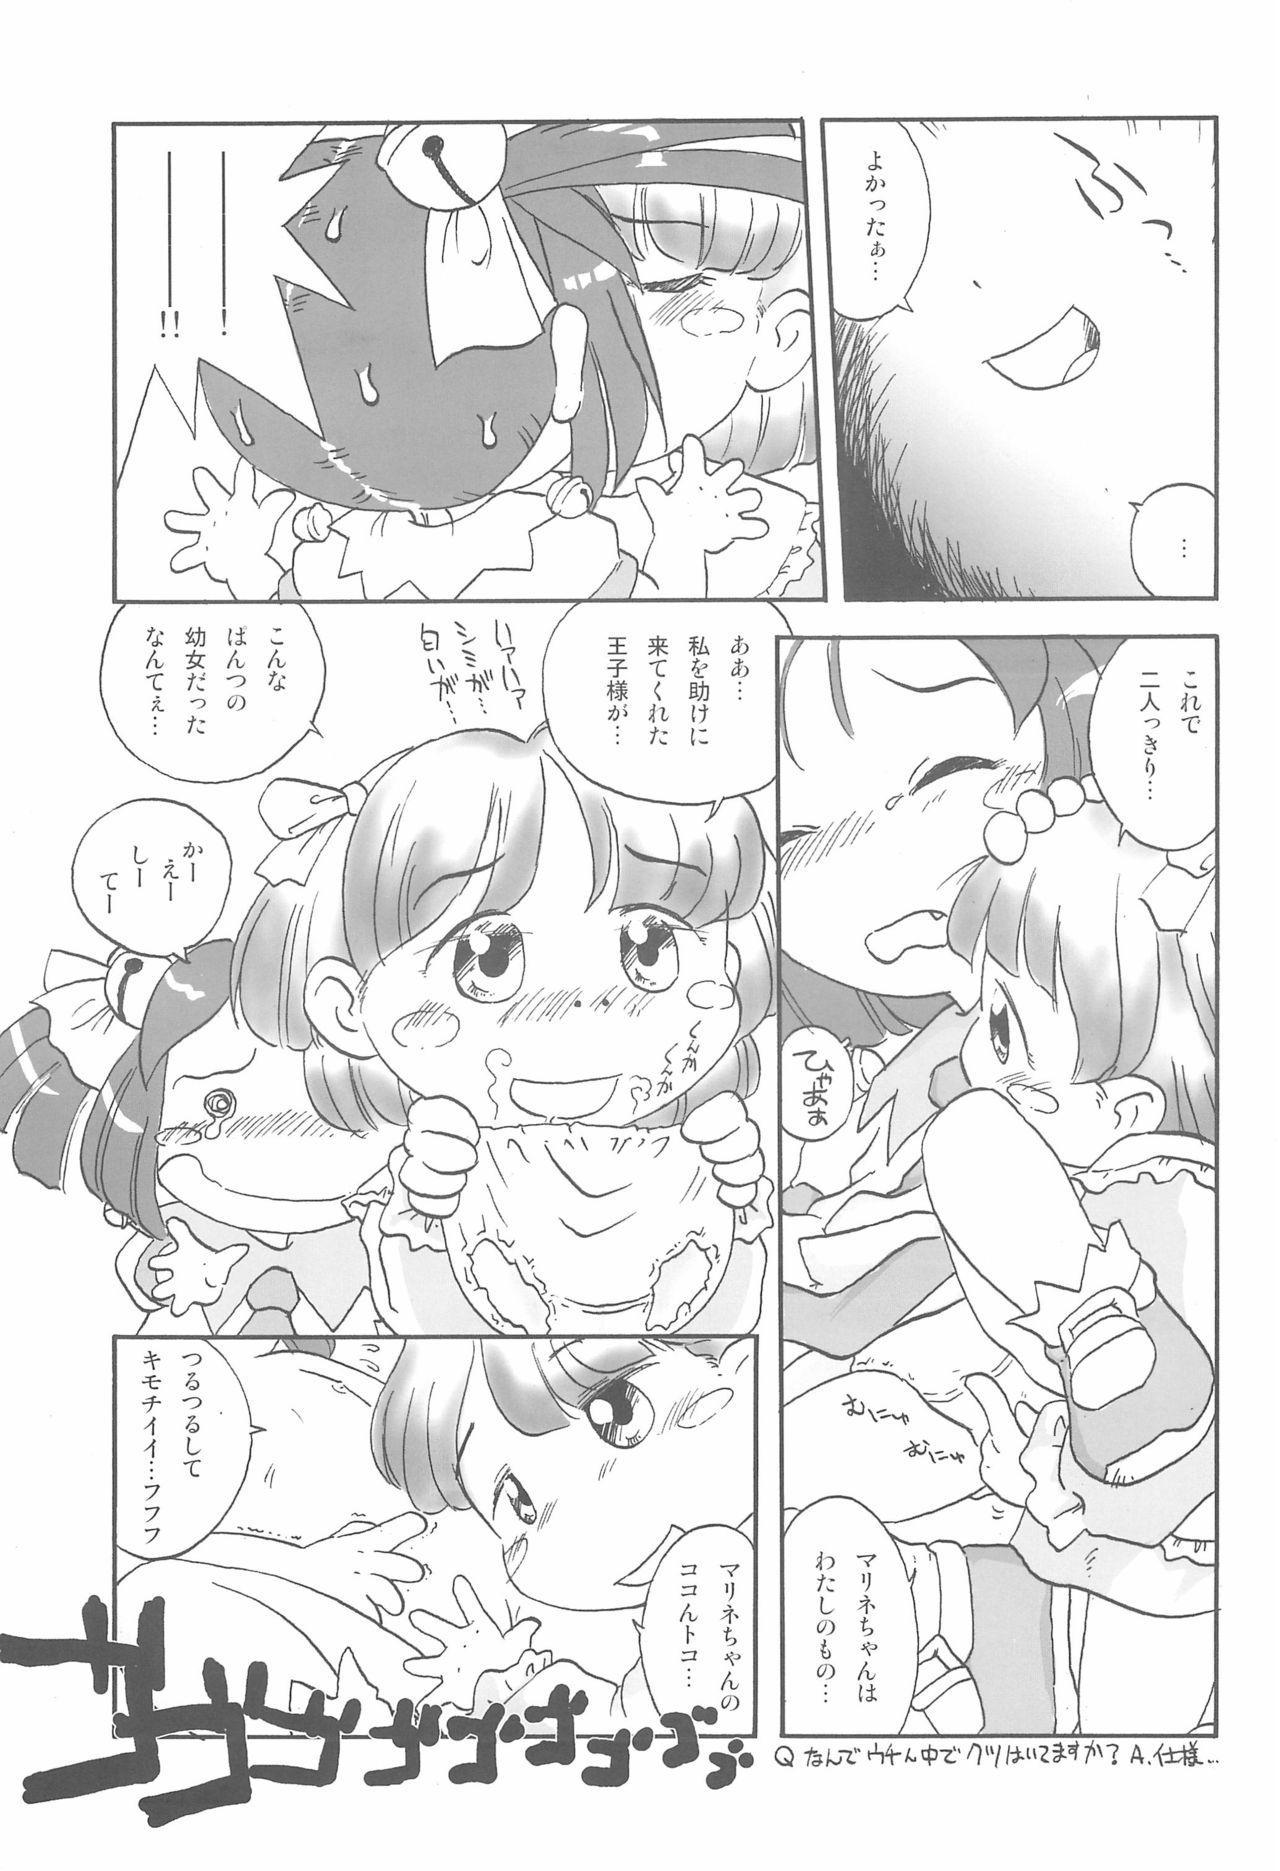 TakoMari BOOK 12